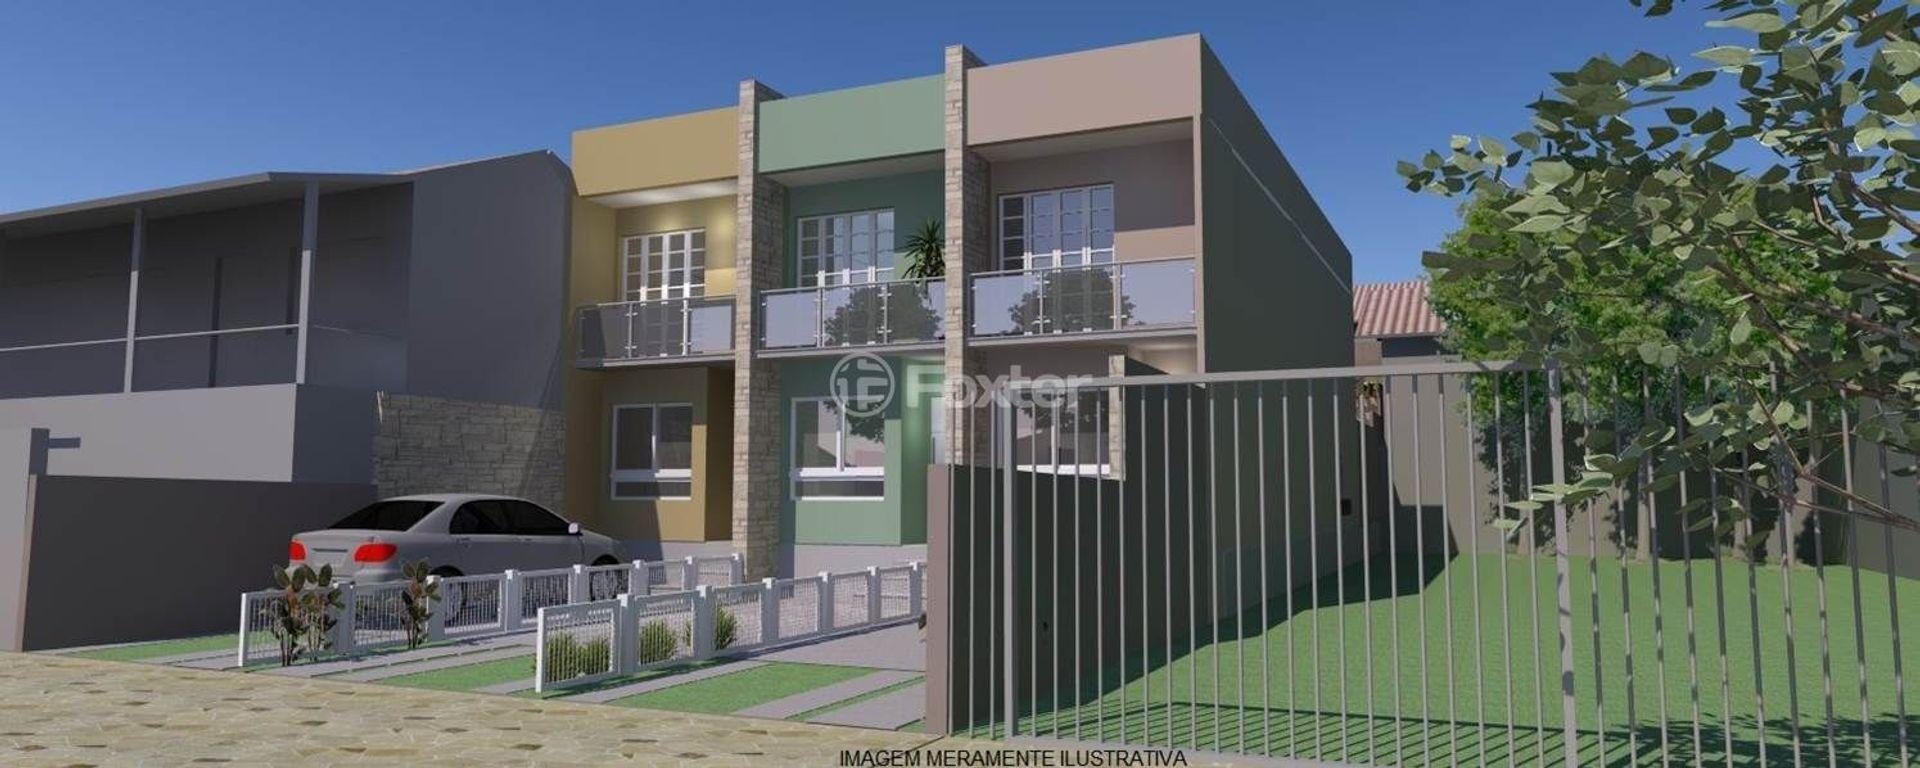 Casa 2 Dorm, Campo Novo, Porto Alegre (142898) - Foto 4